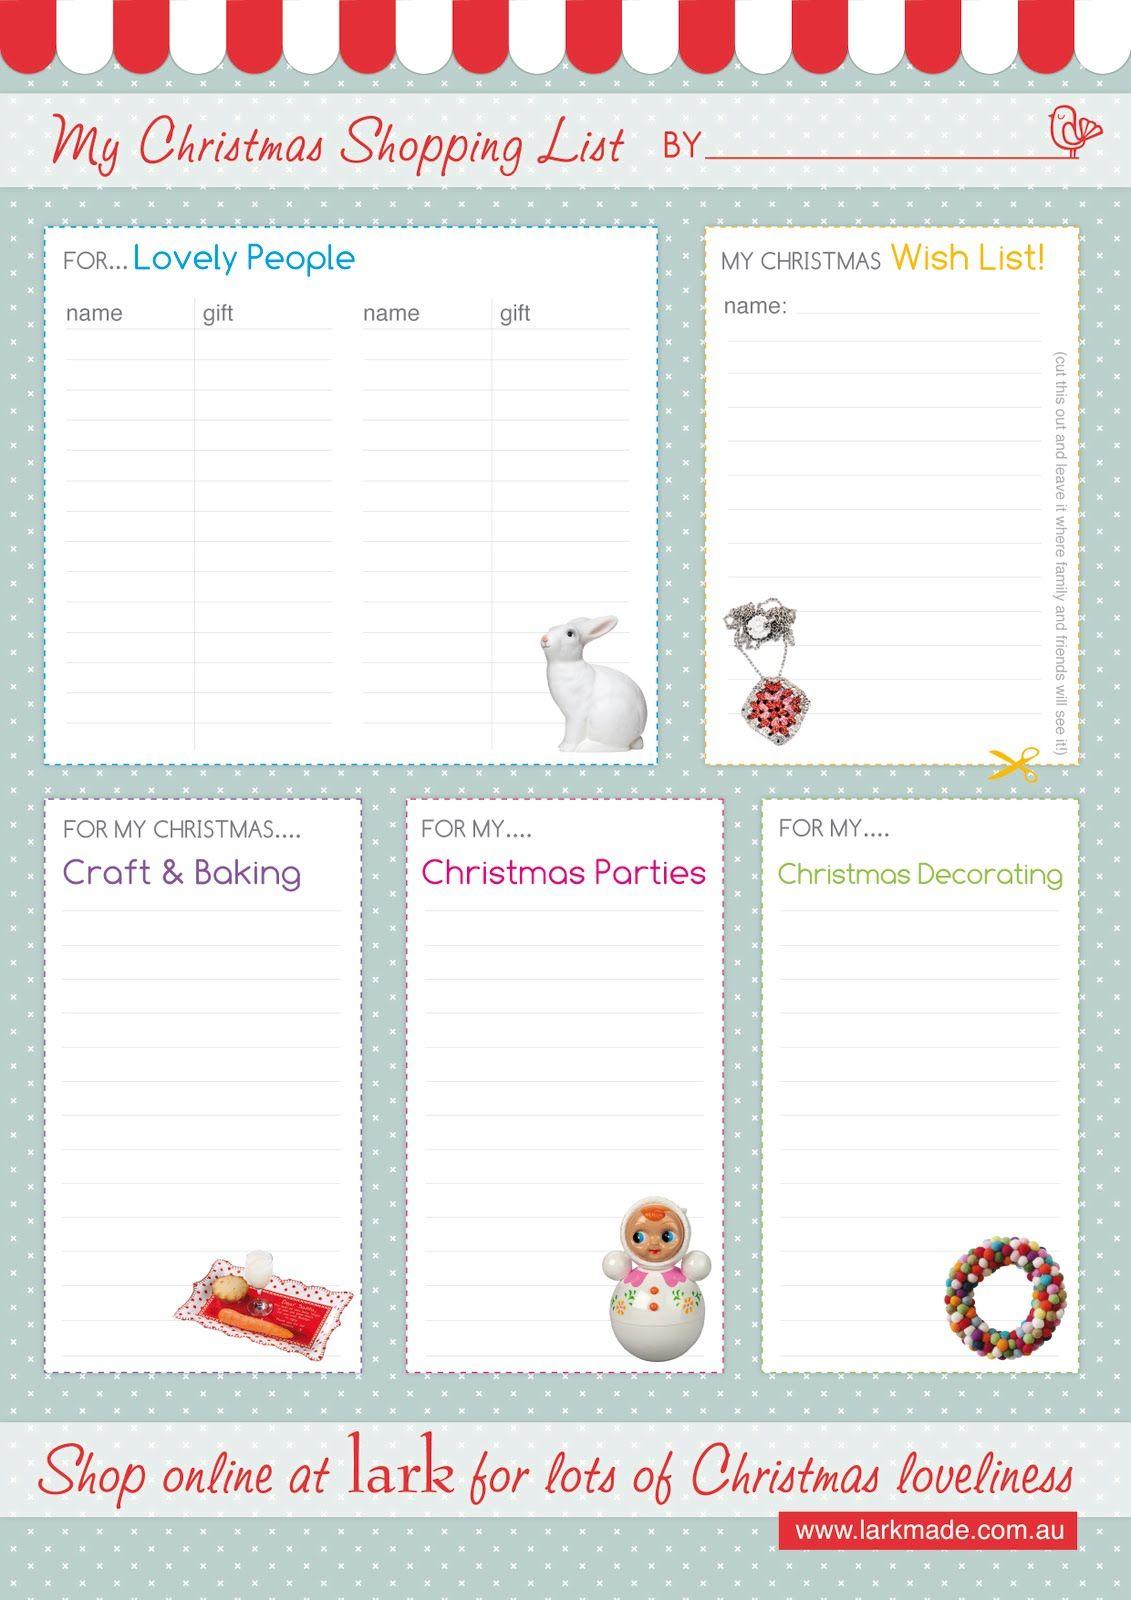 Week 5 Inventory And List 12 Weeks Of Christmas Planning 247moms 247moms